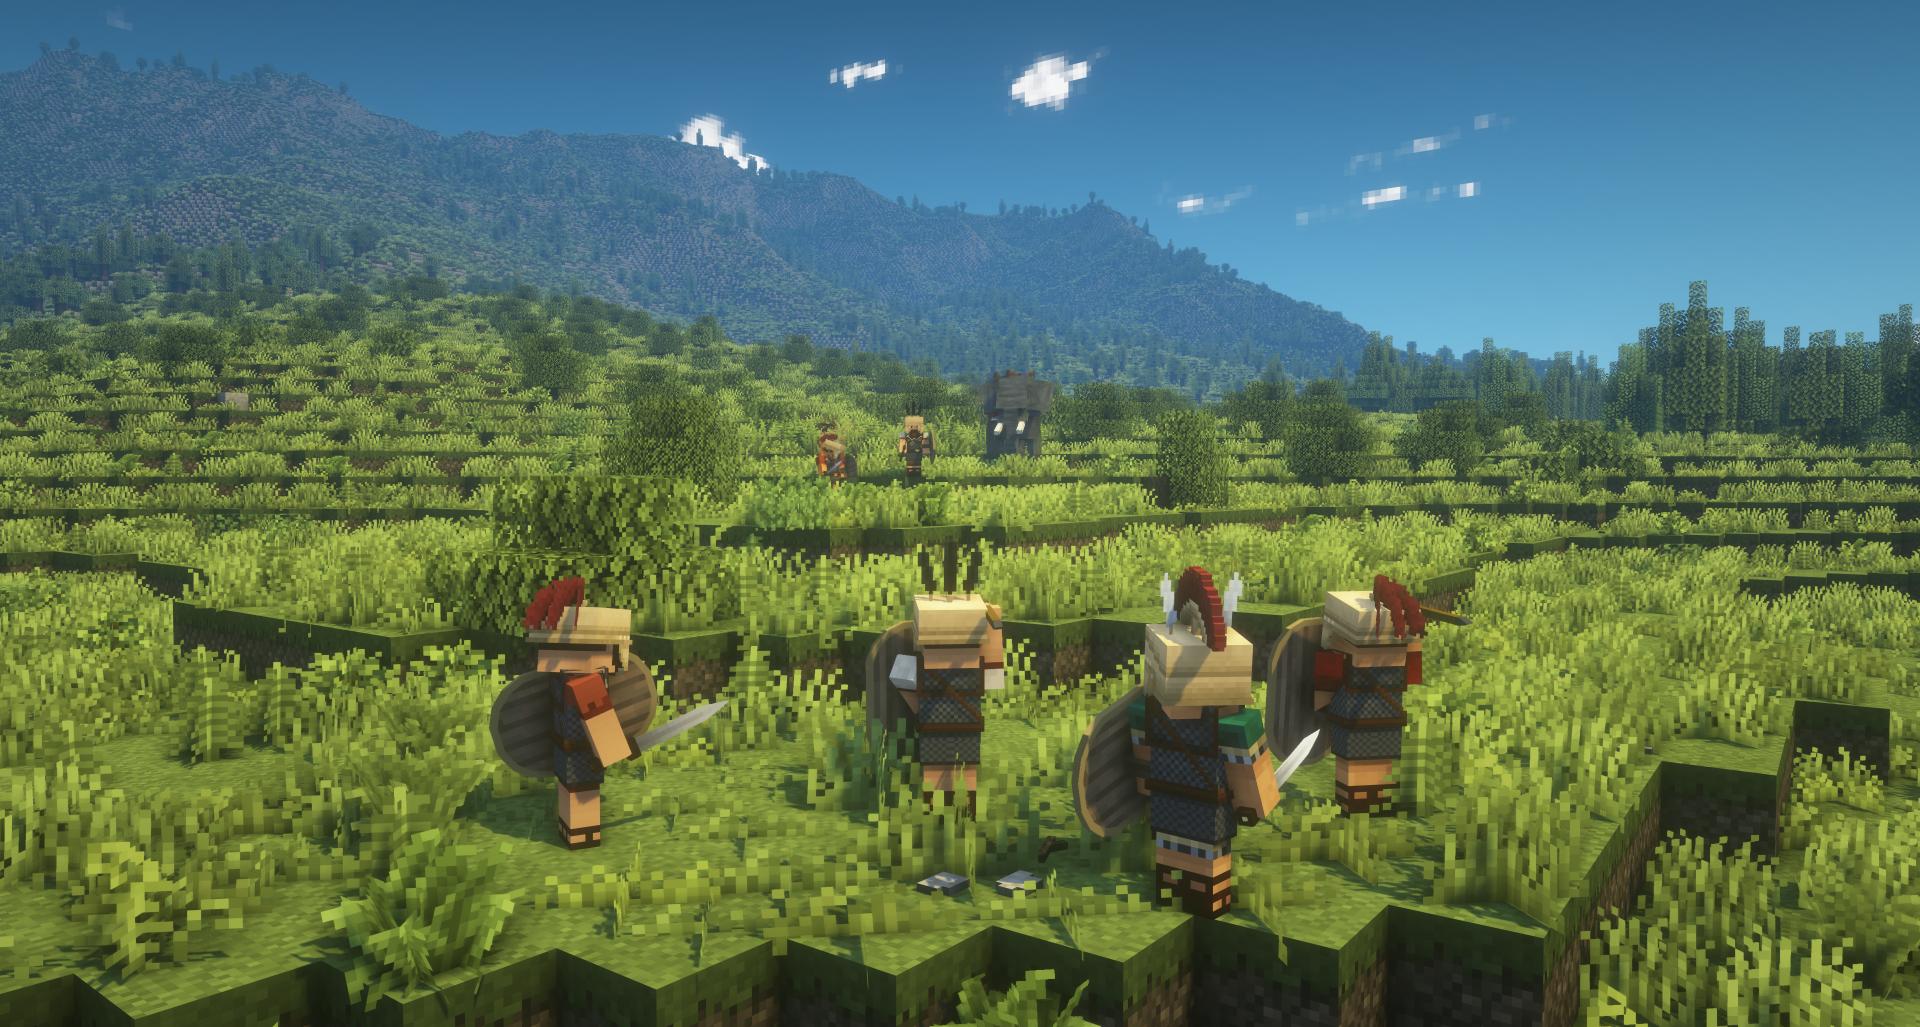 Antiqua Italia Devblog 4: Gladiators, elephants, and builds